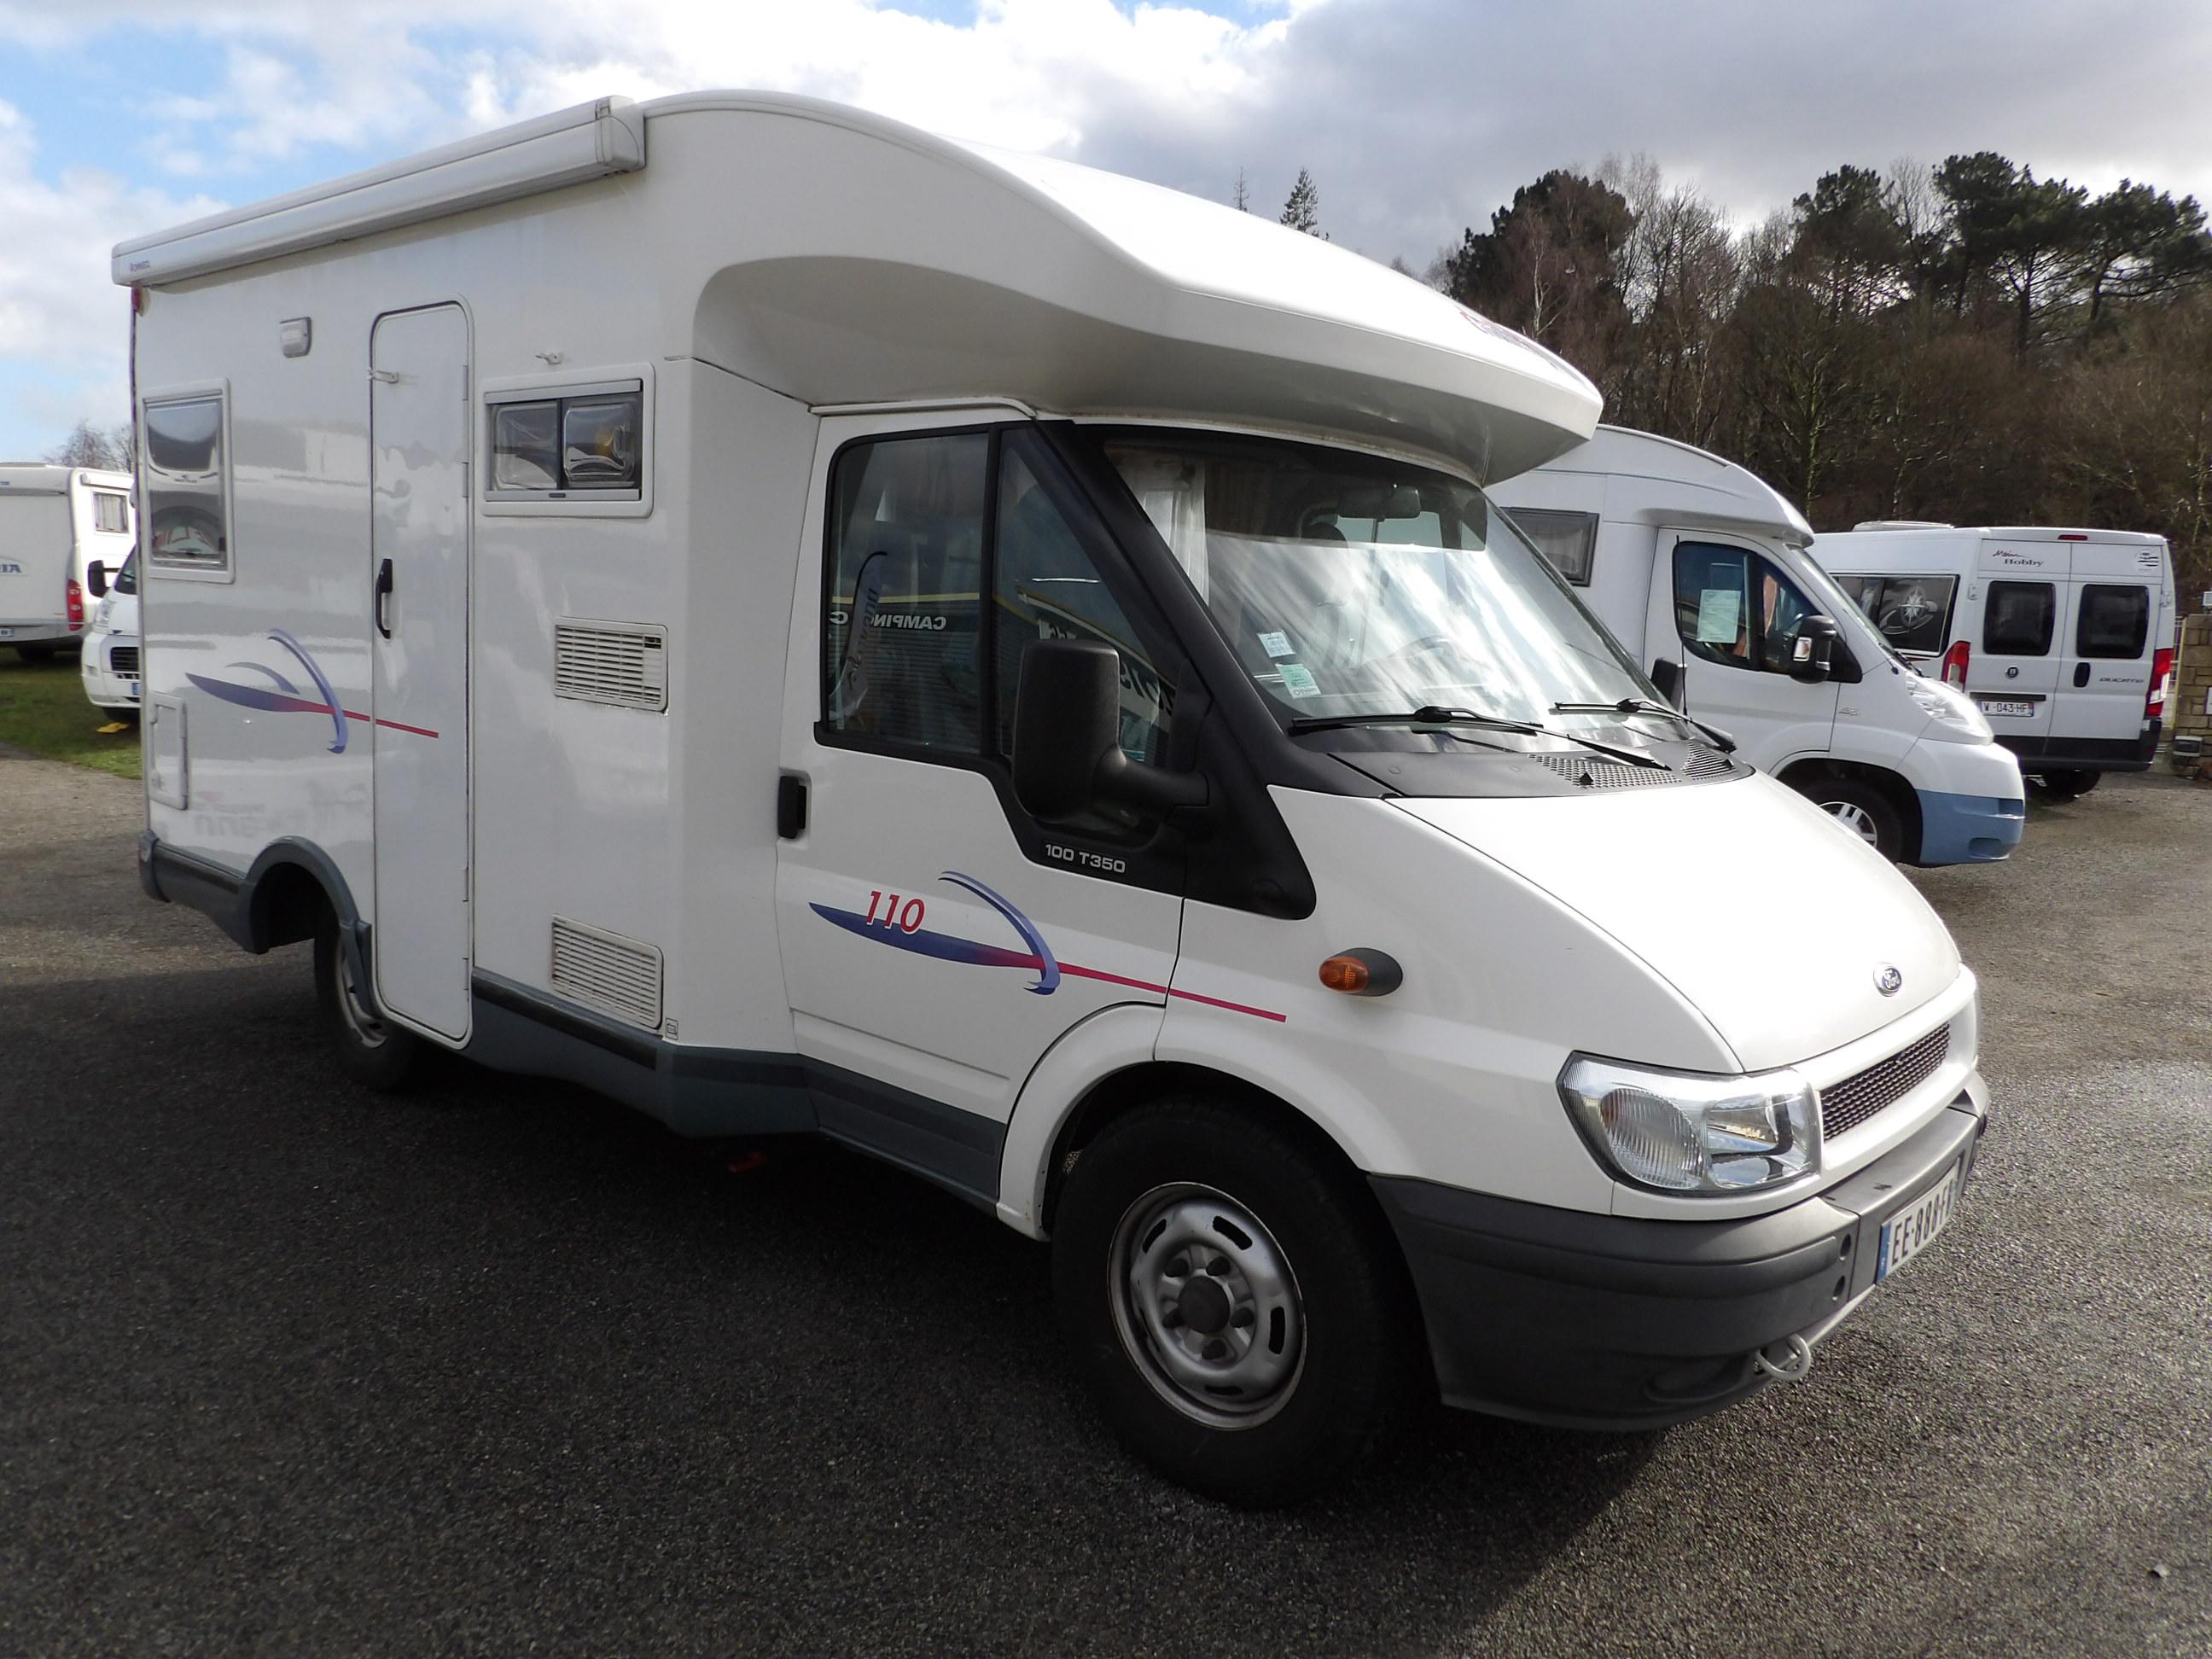 challenger 110 occasion de 2005 ford camping car en vente locoal mendon sortie 36. Black Bedroom Furniture Sets. Home Design Ideas